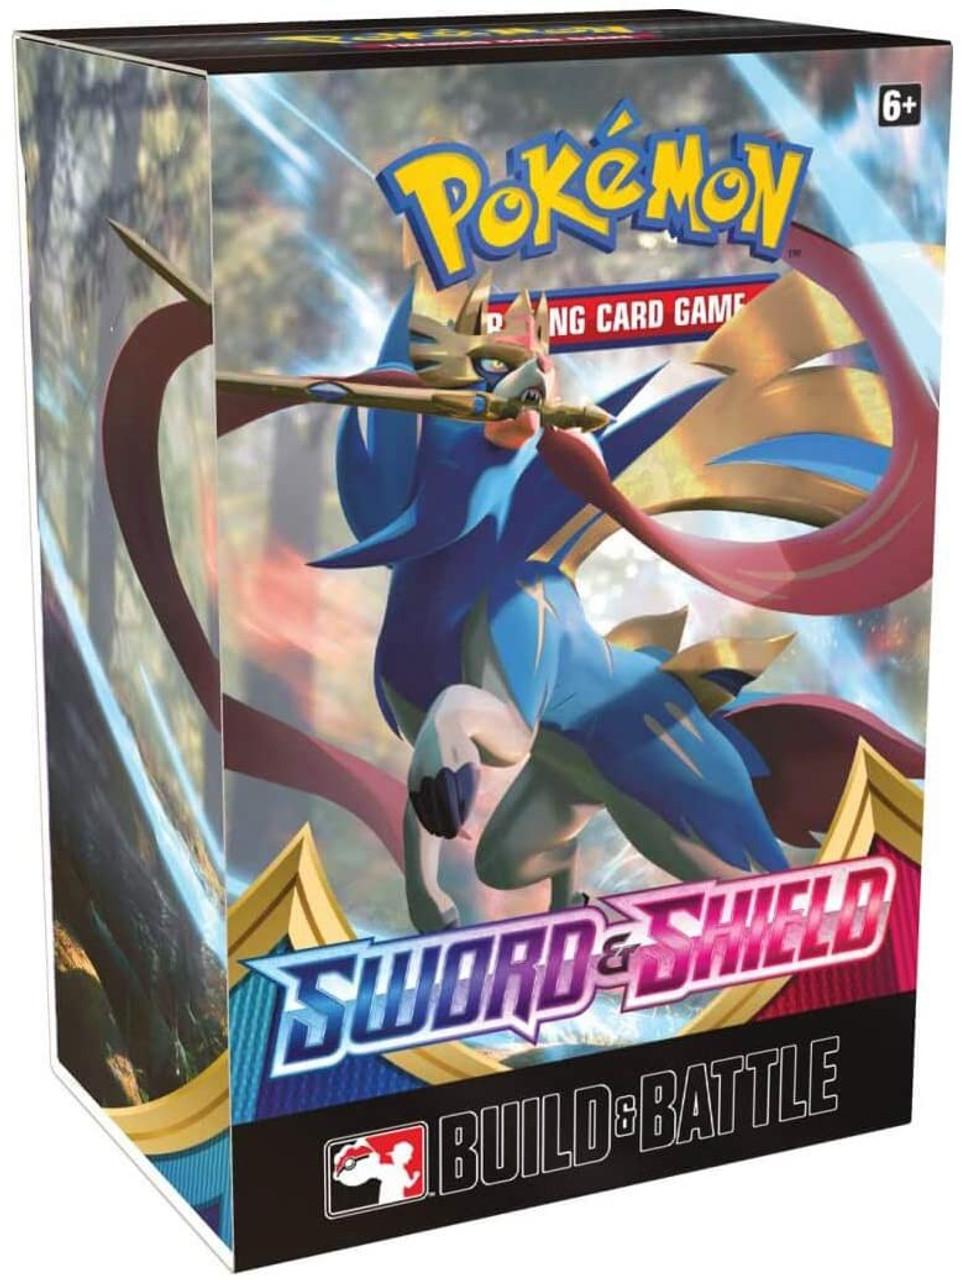 Pokemon Trading Card Game Sword Shield Build Battle Set Pre Order Ships February